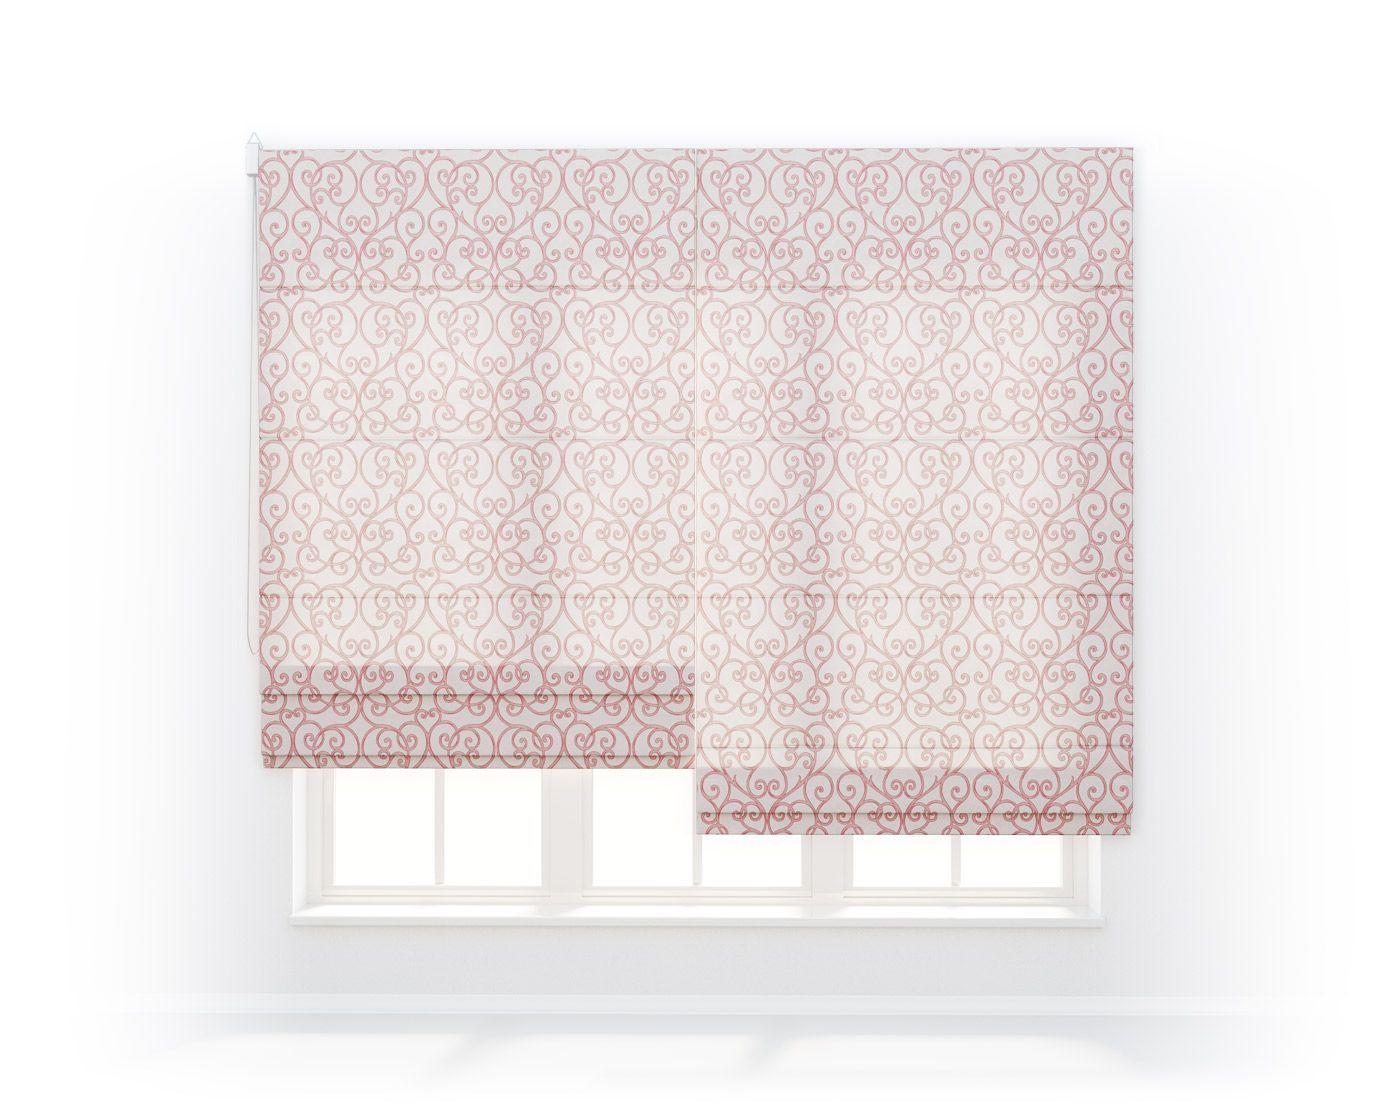 Римские шторы Cameo Oval, Cameo-Oval-02